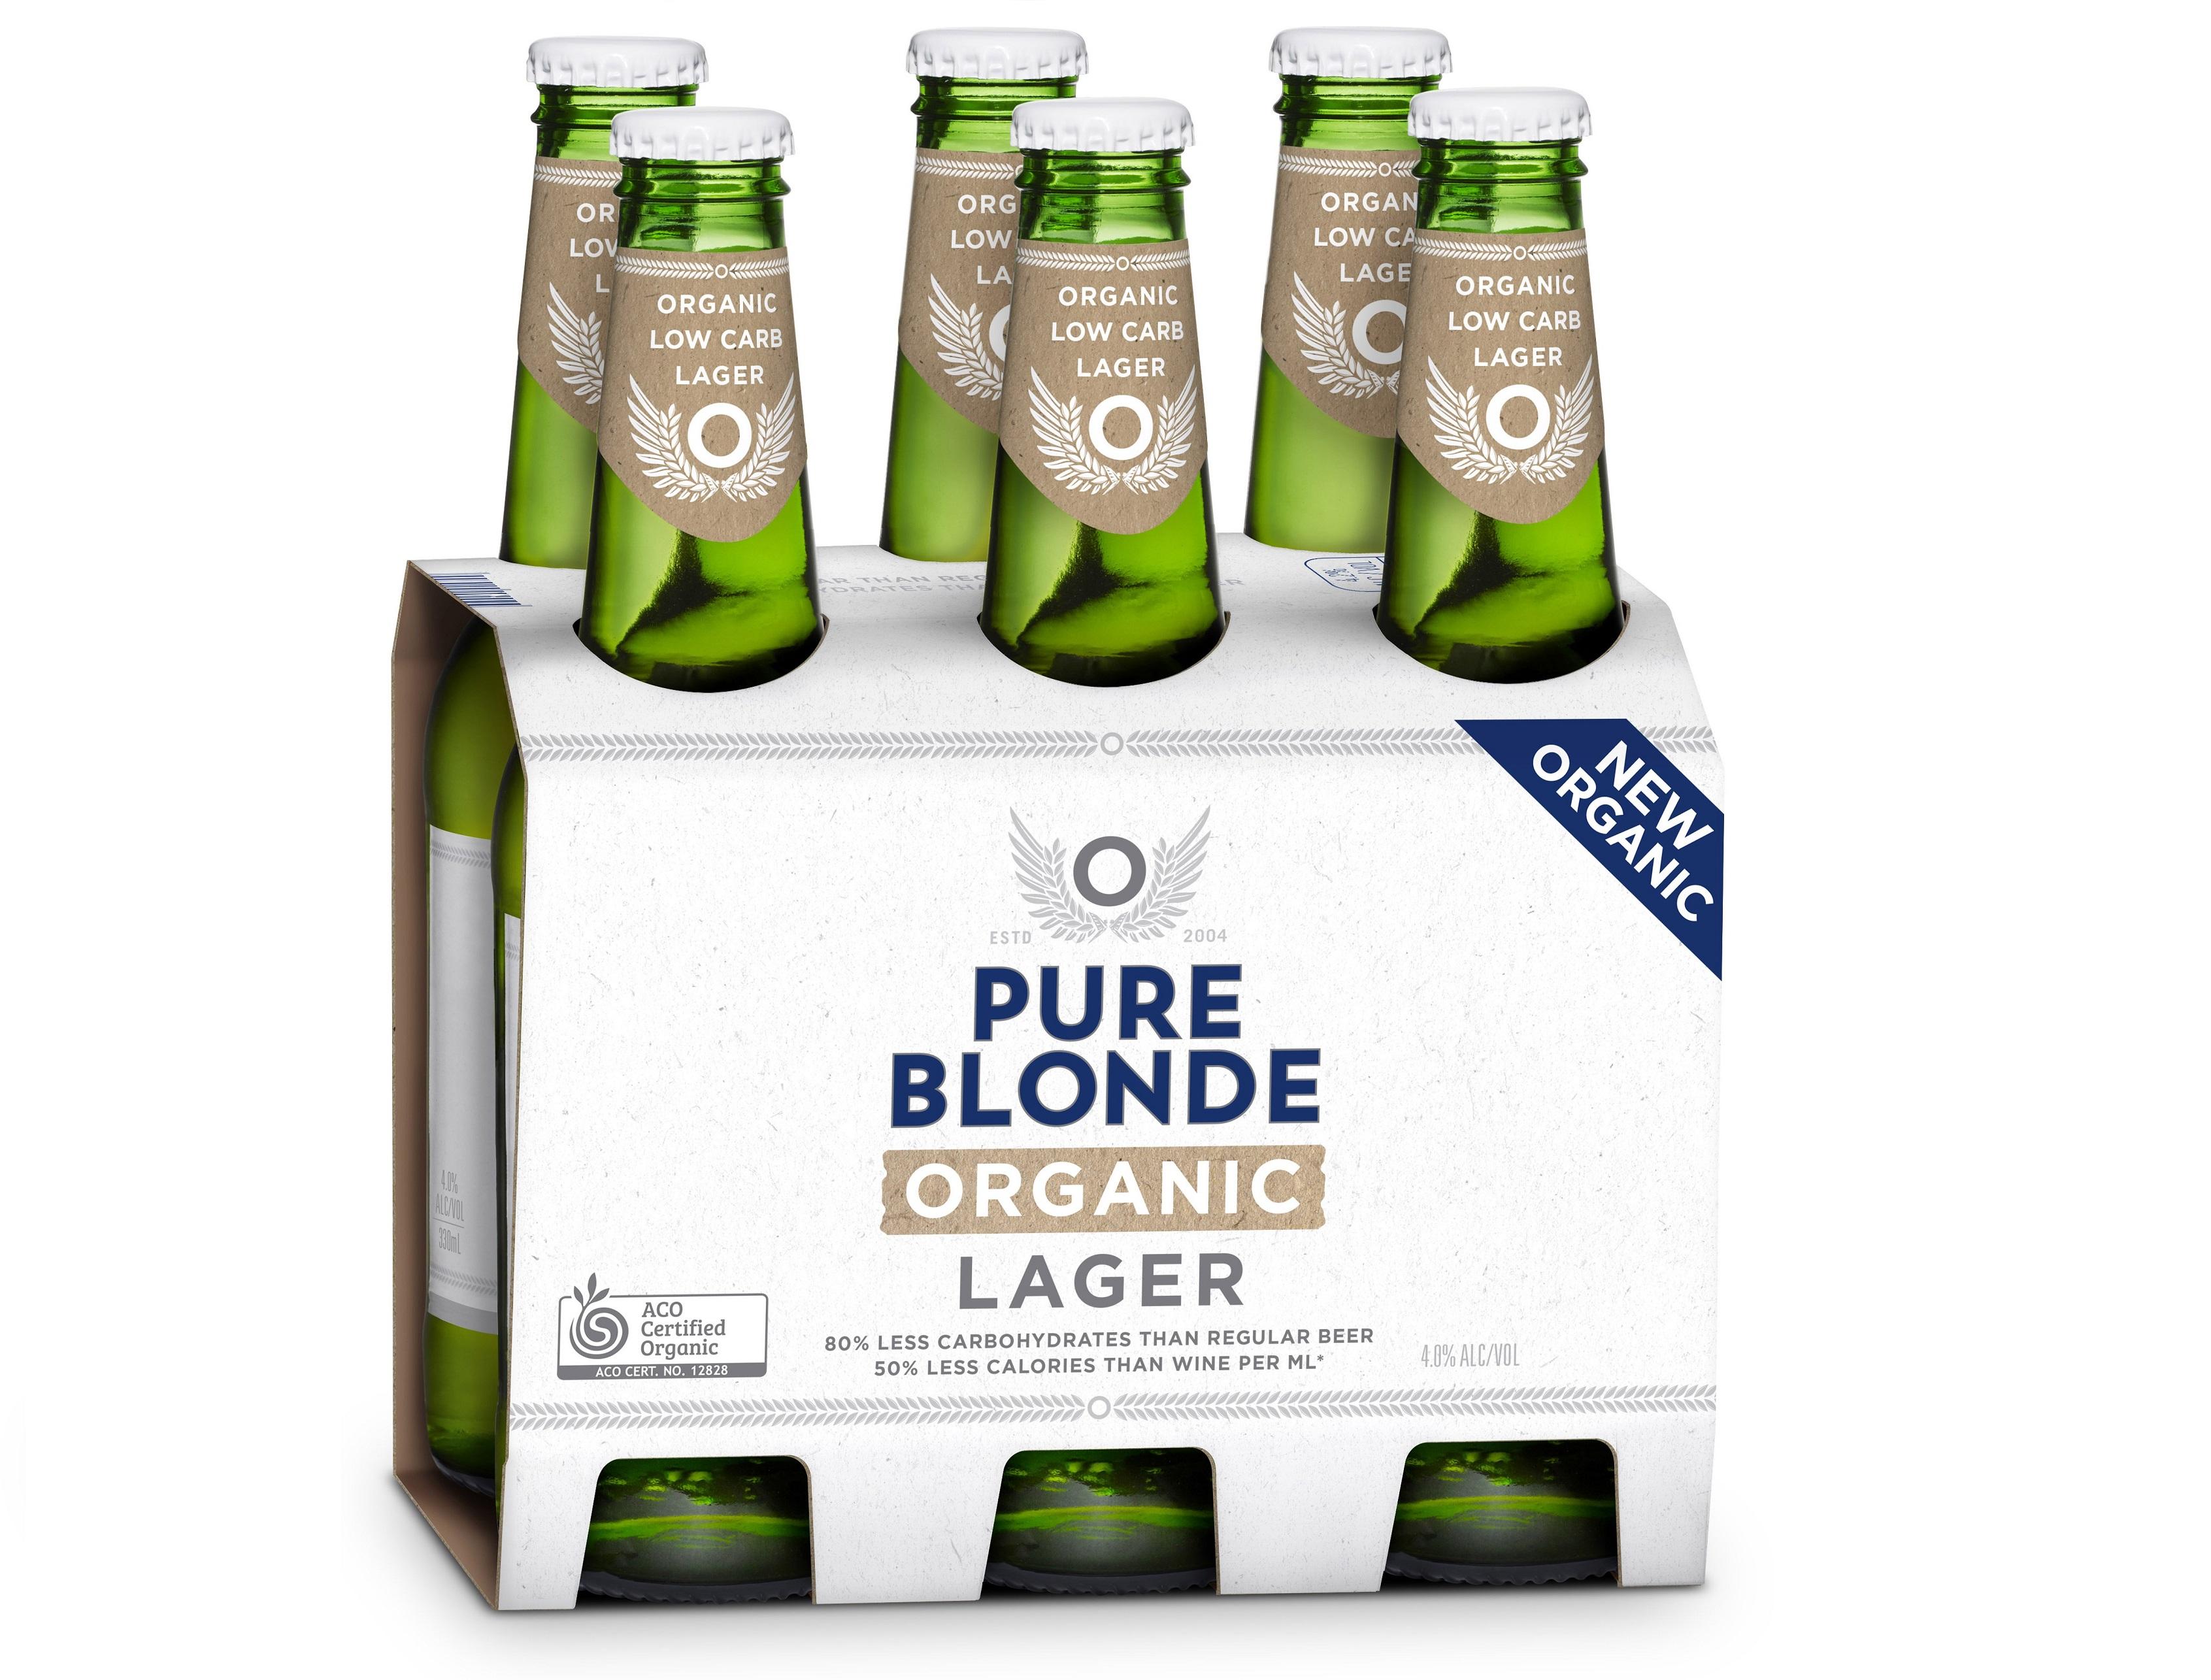 Aussie Beer Shares Its Recipe On Billboard Adverts photo